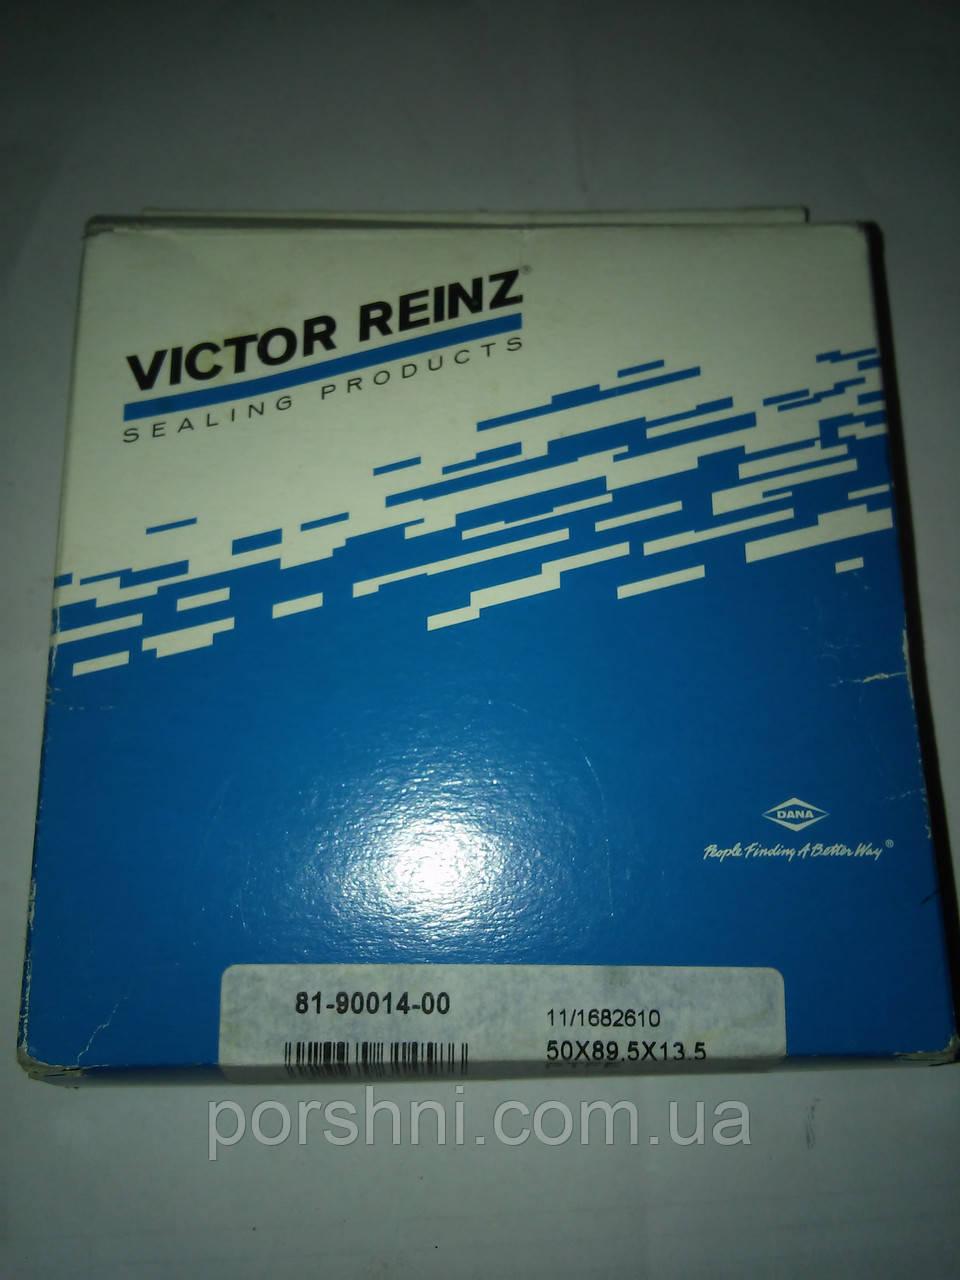 Сальник  задний  коленвала Форд  Мондео 2.0 DURATEC  2001 --  V/REINZ  81-90012-00